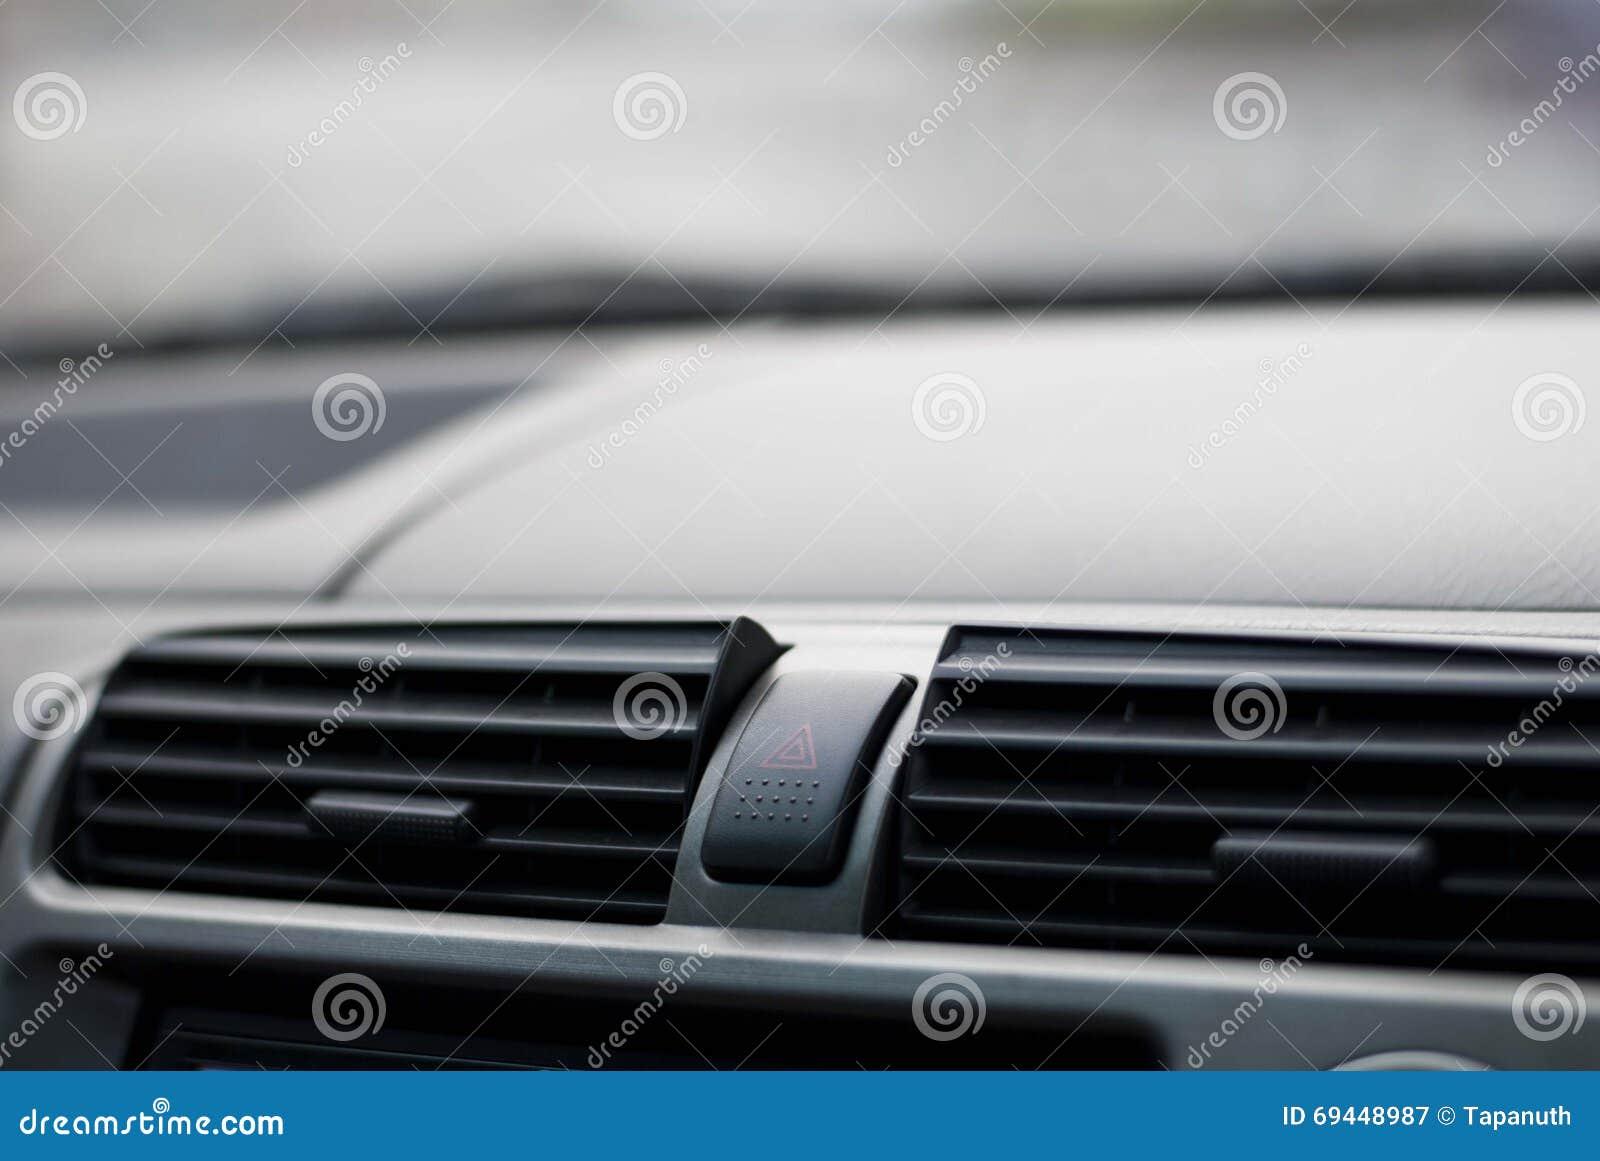 emergency light indicator button car stock photos